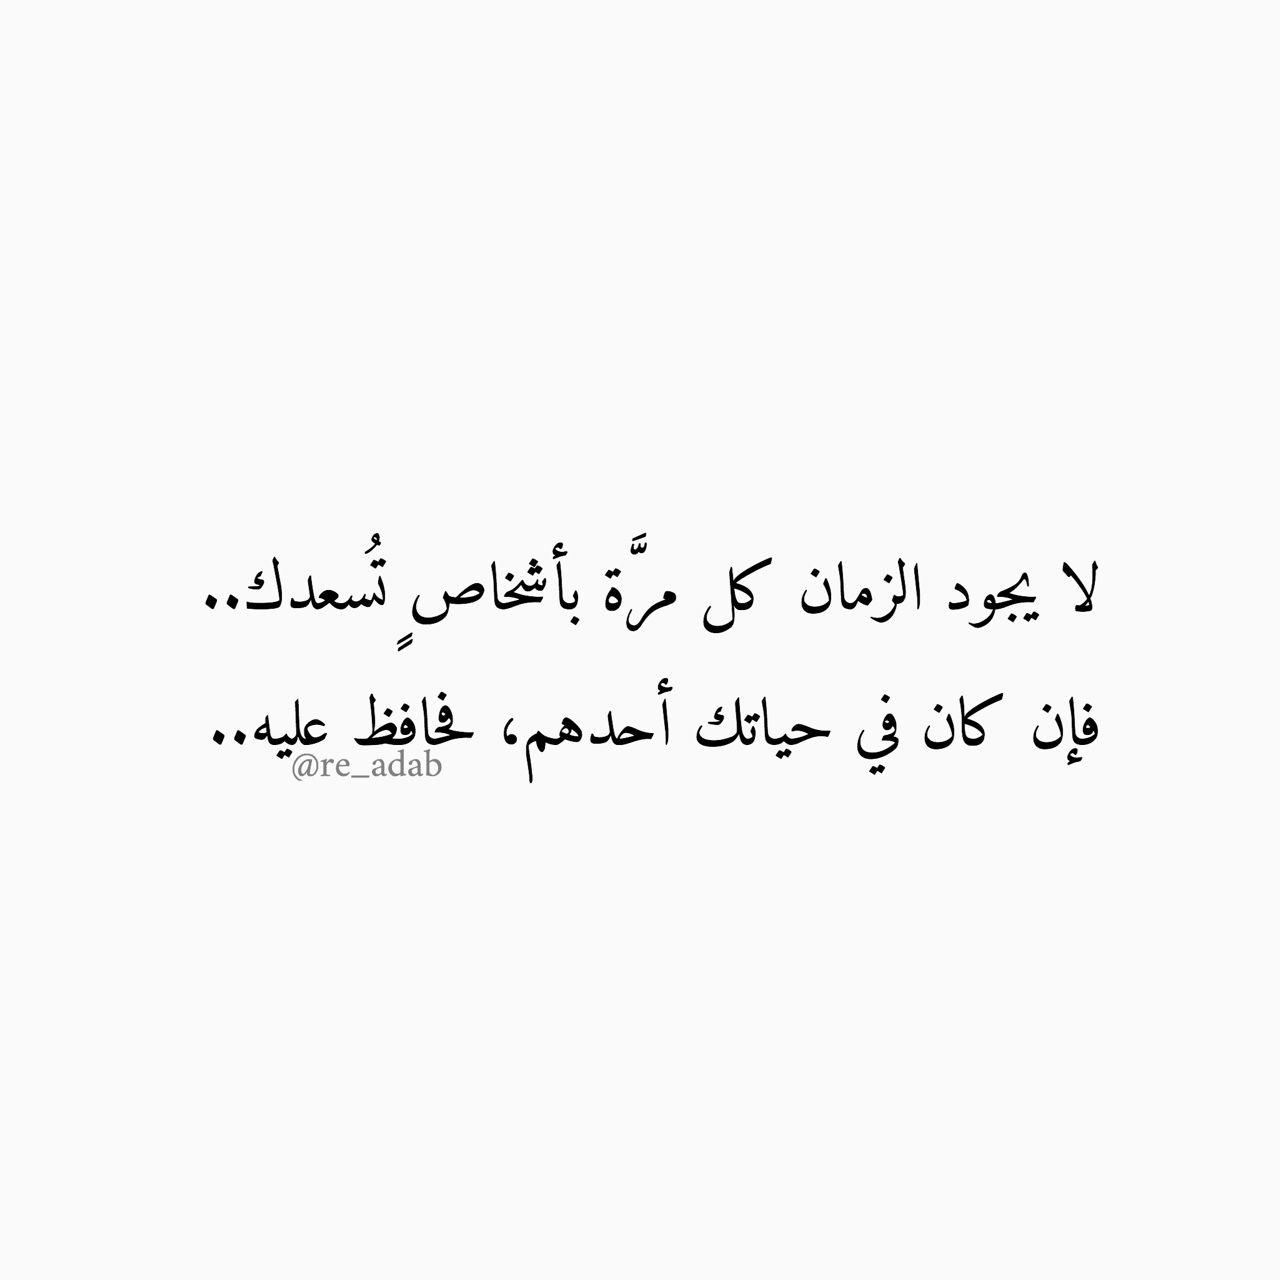 حافظ عليه Cool Words Islamic Quotes Arabic Quotes